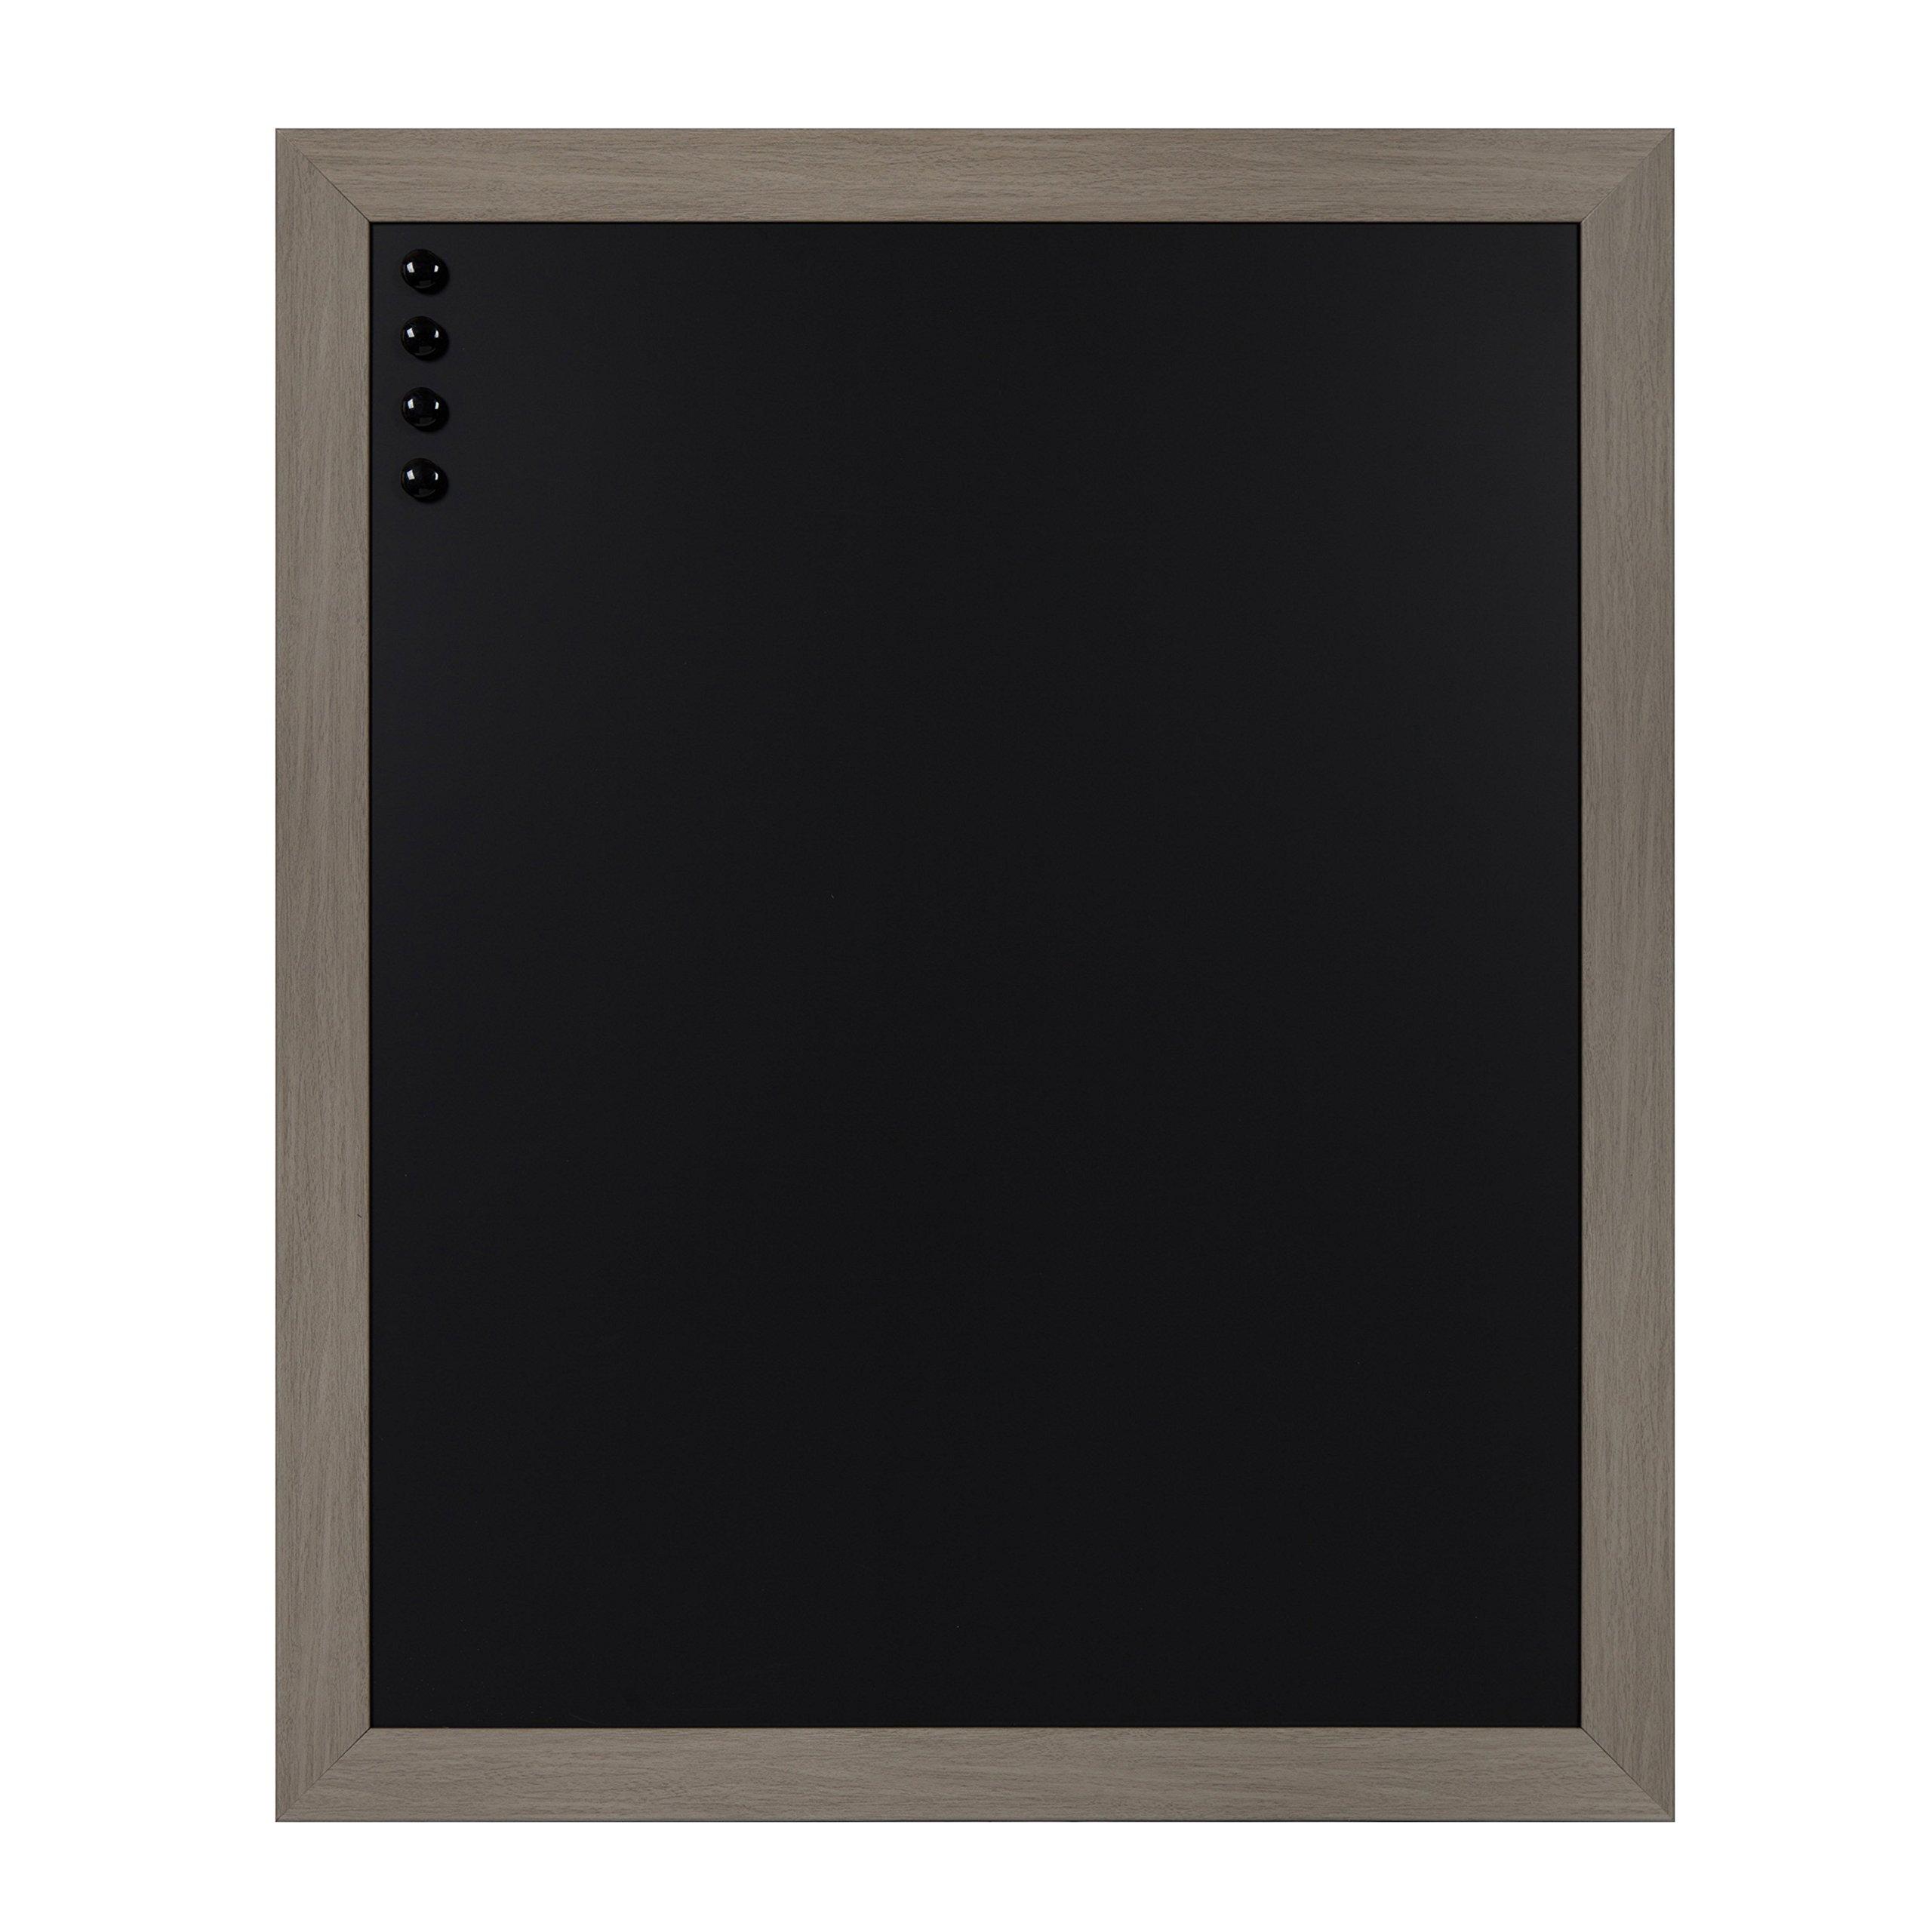 DesignOvation Beatrice Large Framed Magnetic Chalkboard, 27x33, Gray by DesignOvation